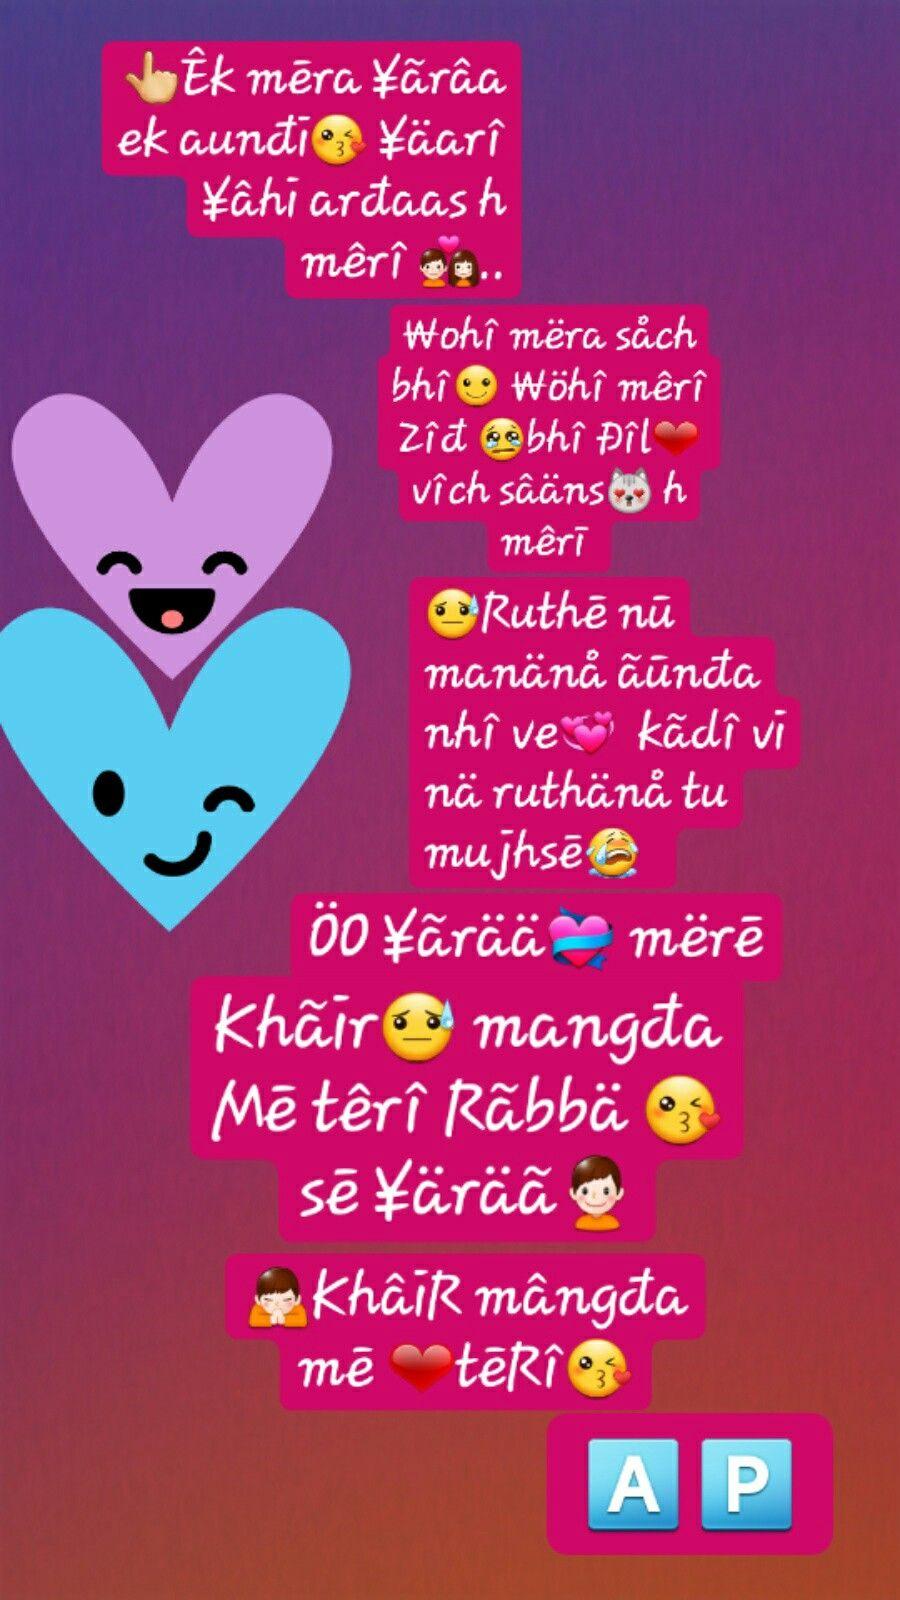 Ect 4 Smn Spc My Words Punjabi Love Quotes